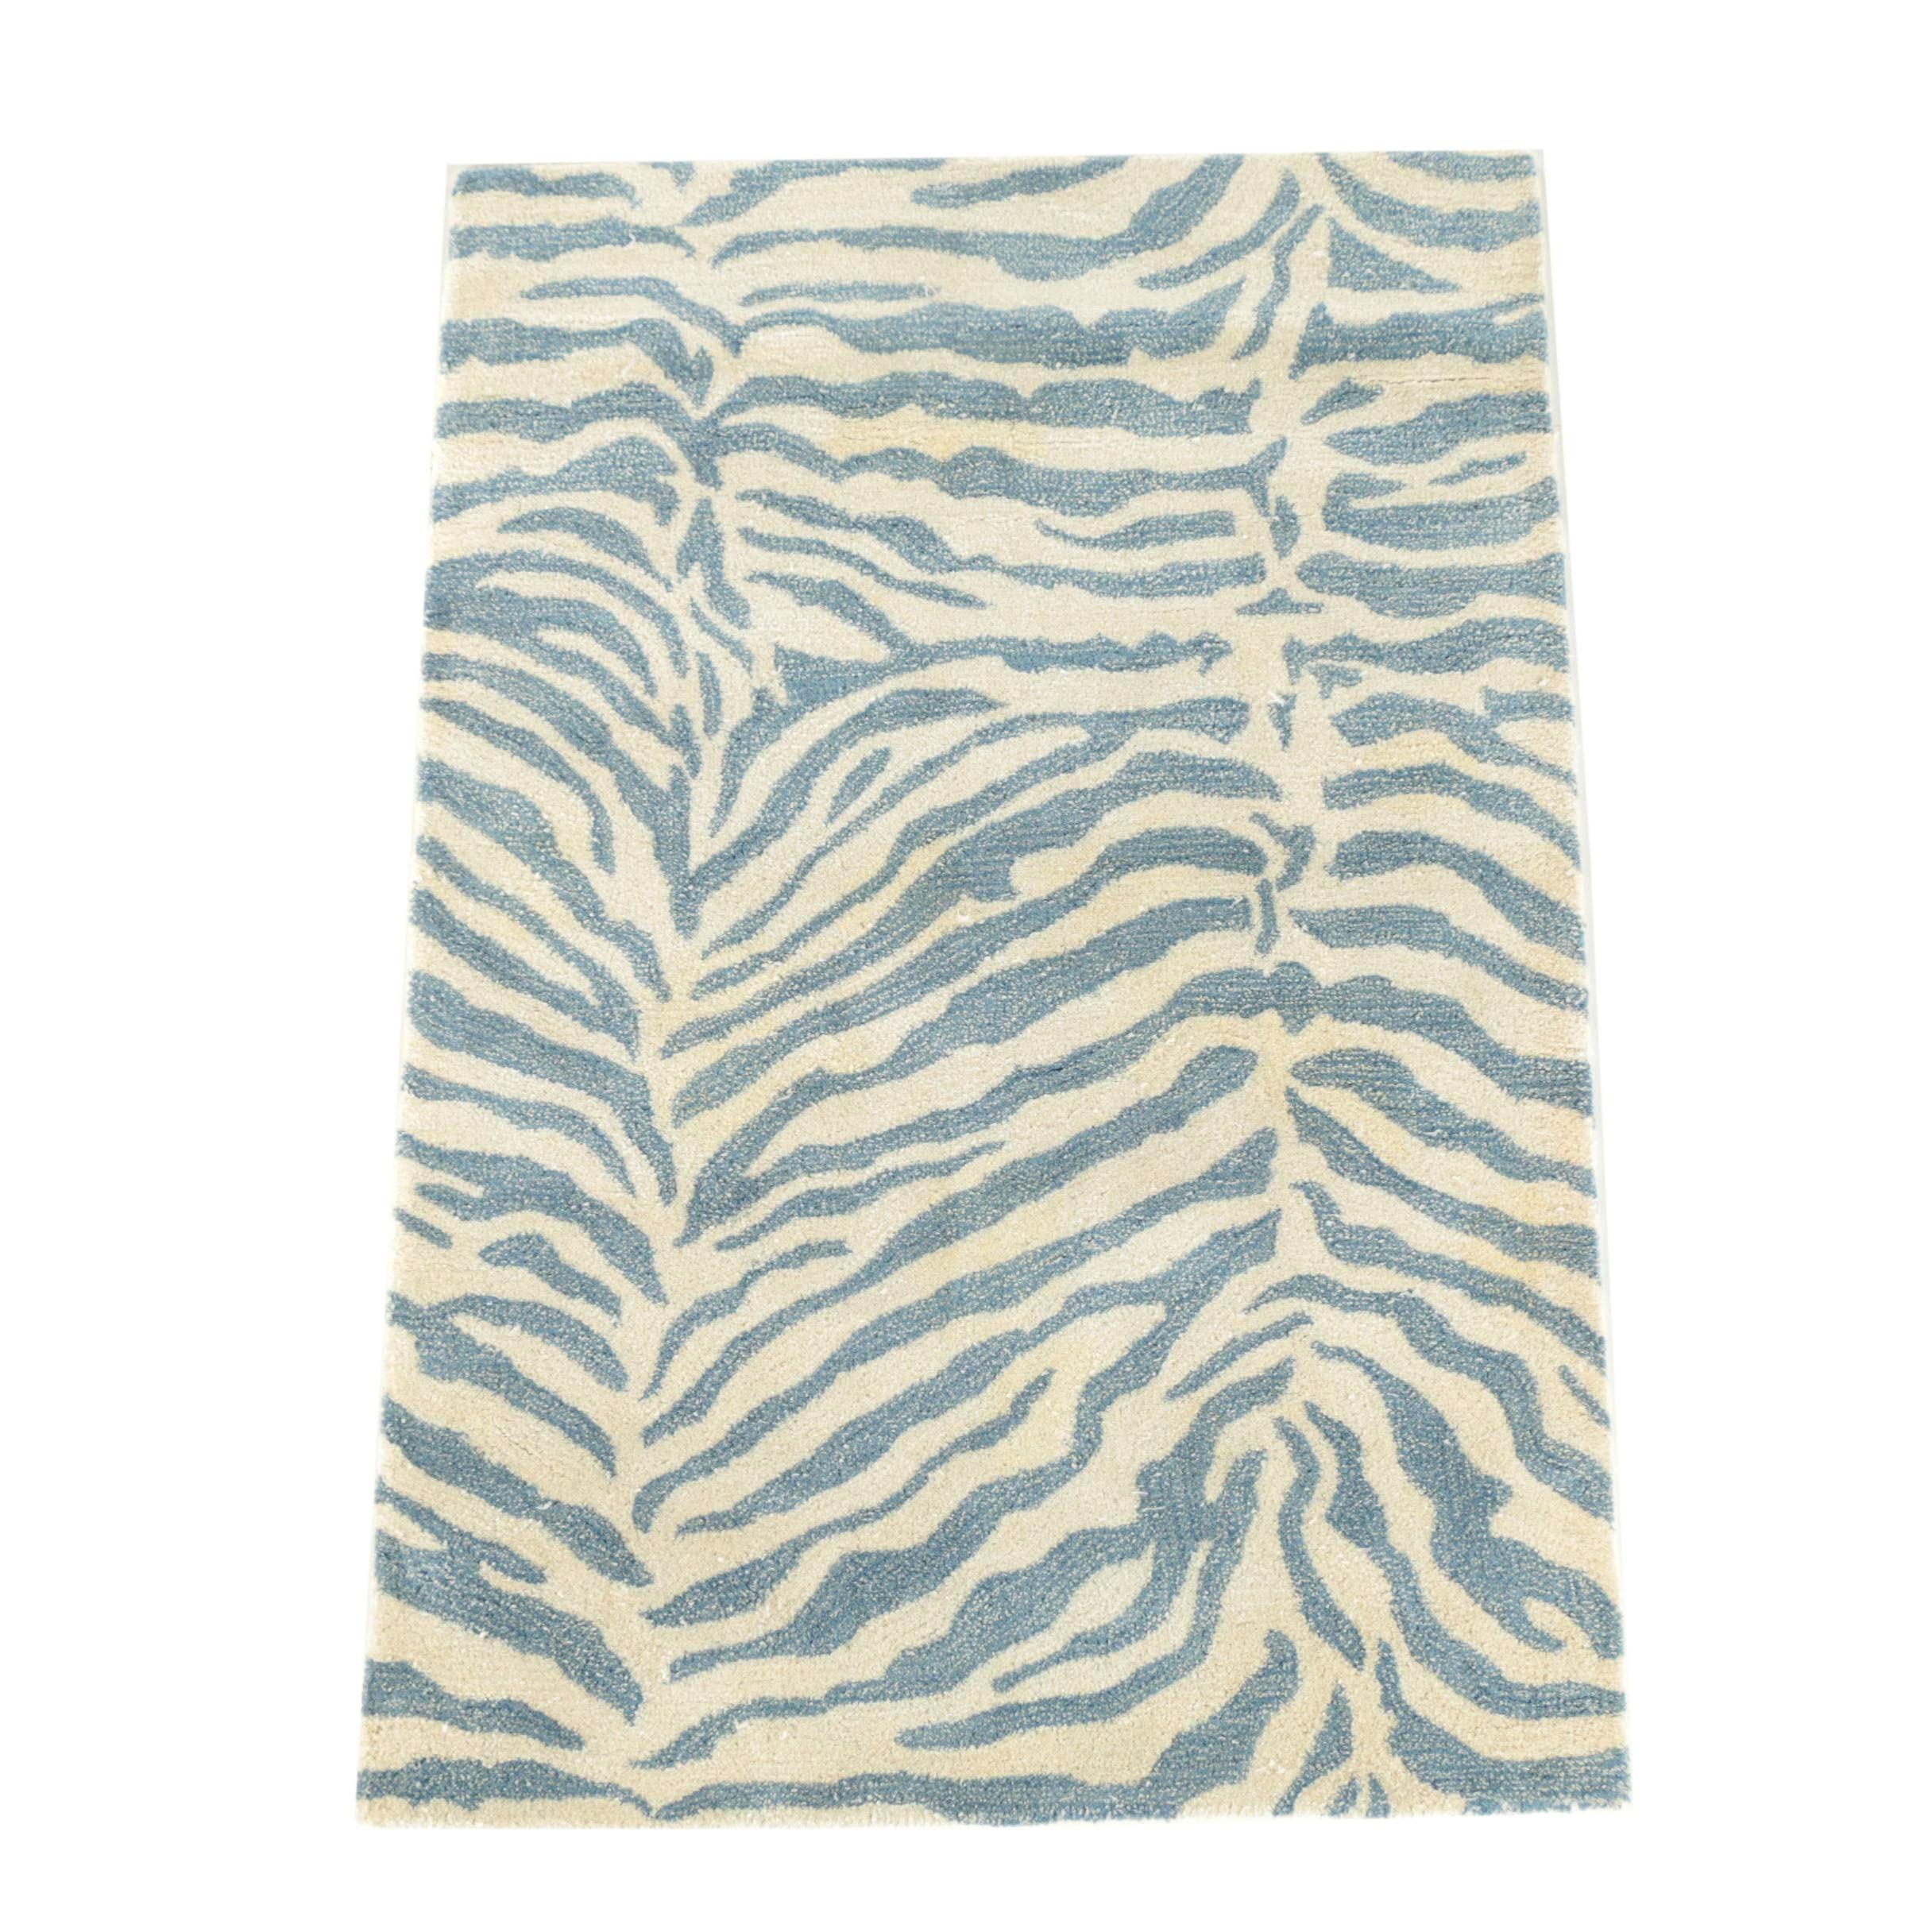 Tufted Indian Zebra Print Wool Blend Area Rug